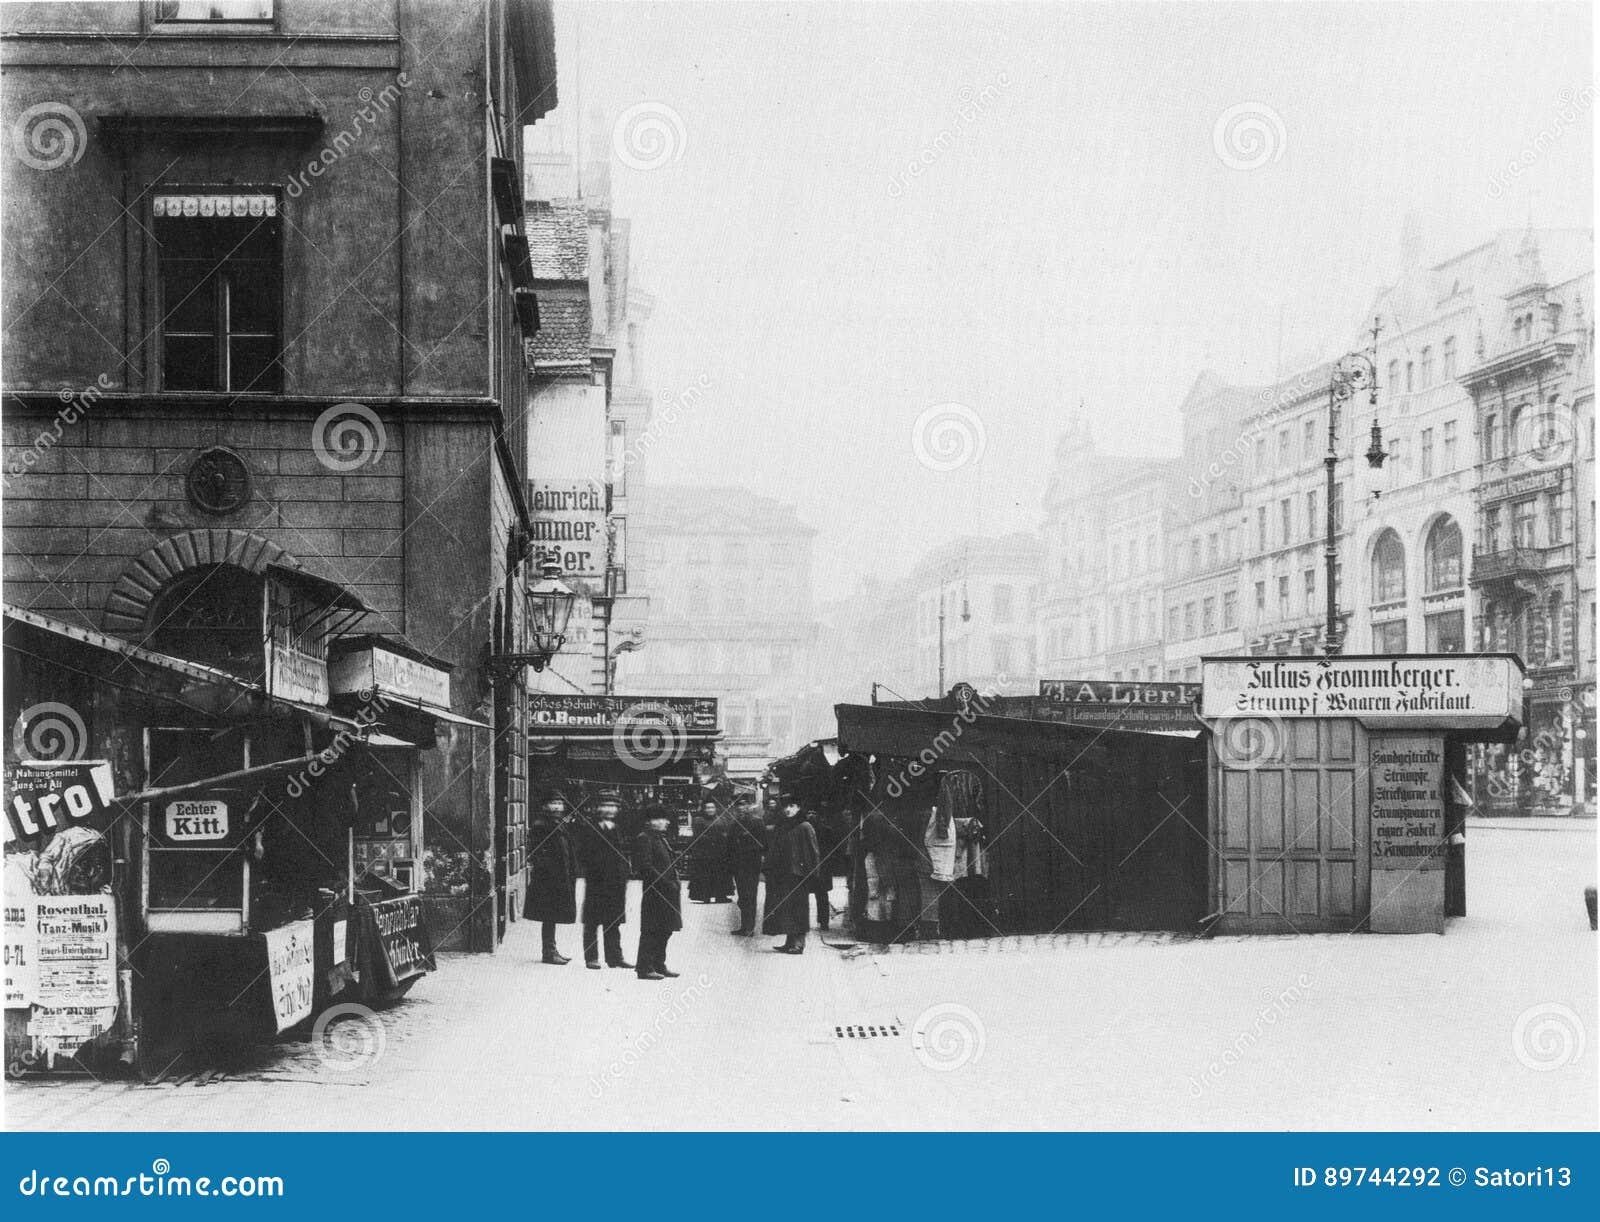 https://thumbs.dreamstime.com/z/facades-old-historic-tenements-rynek-market-square-wroclaw-breslau-poland-89744292.jpg